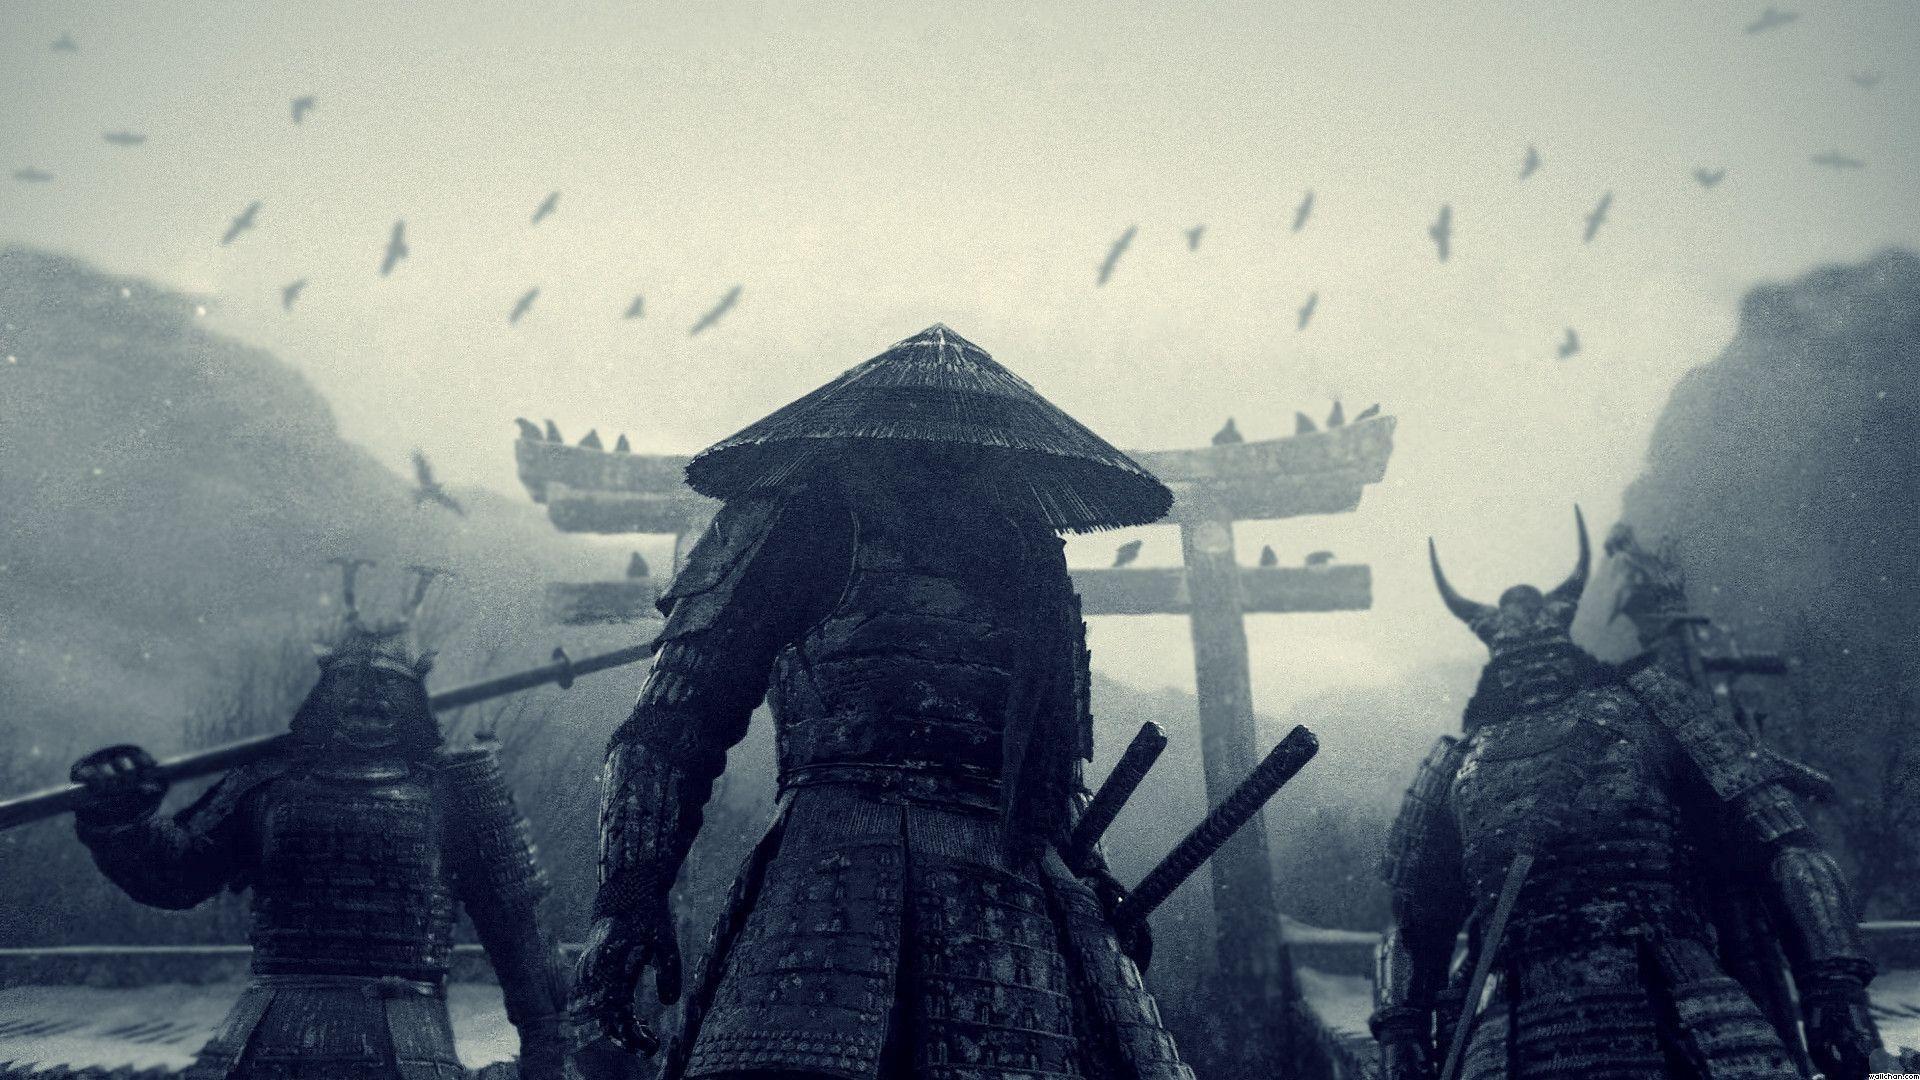 Japanese Samurai Art Wallpapers